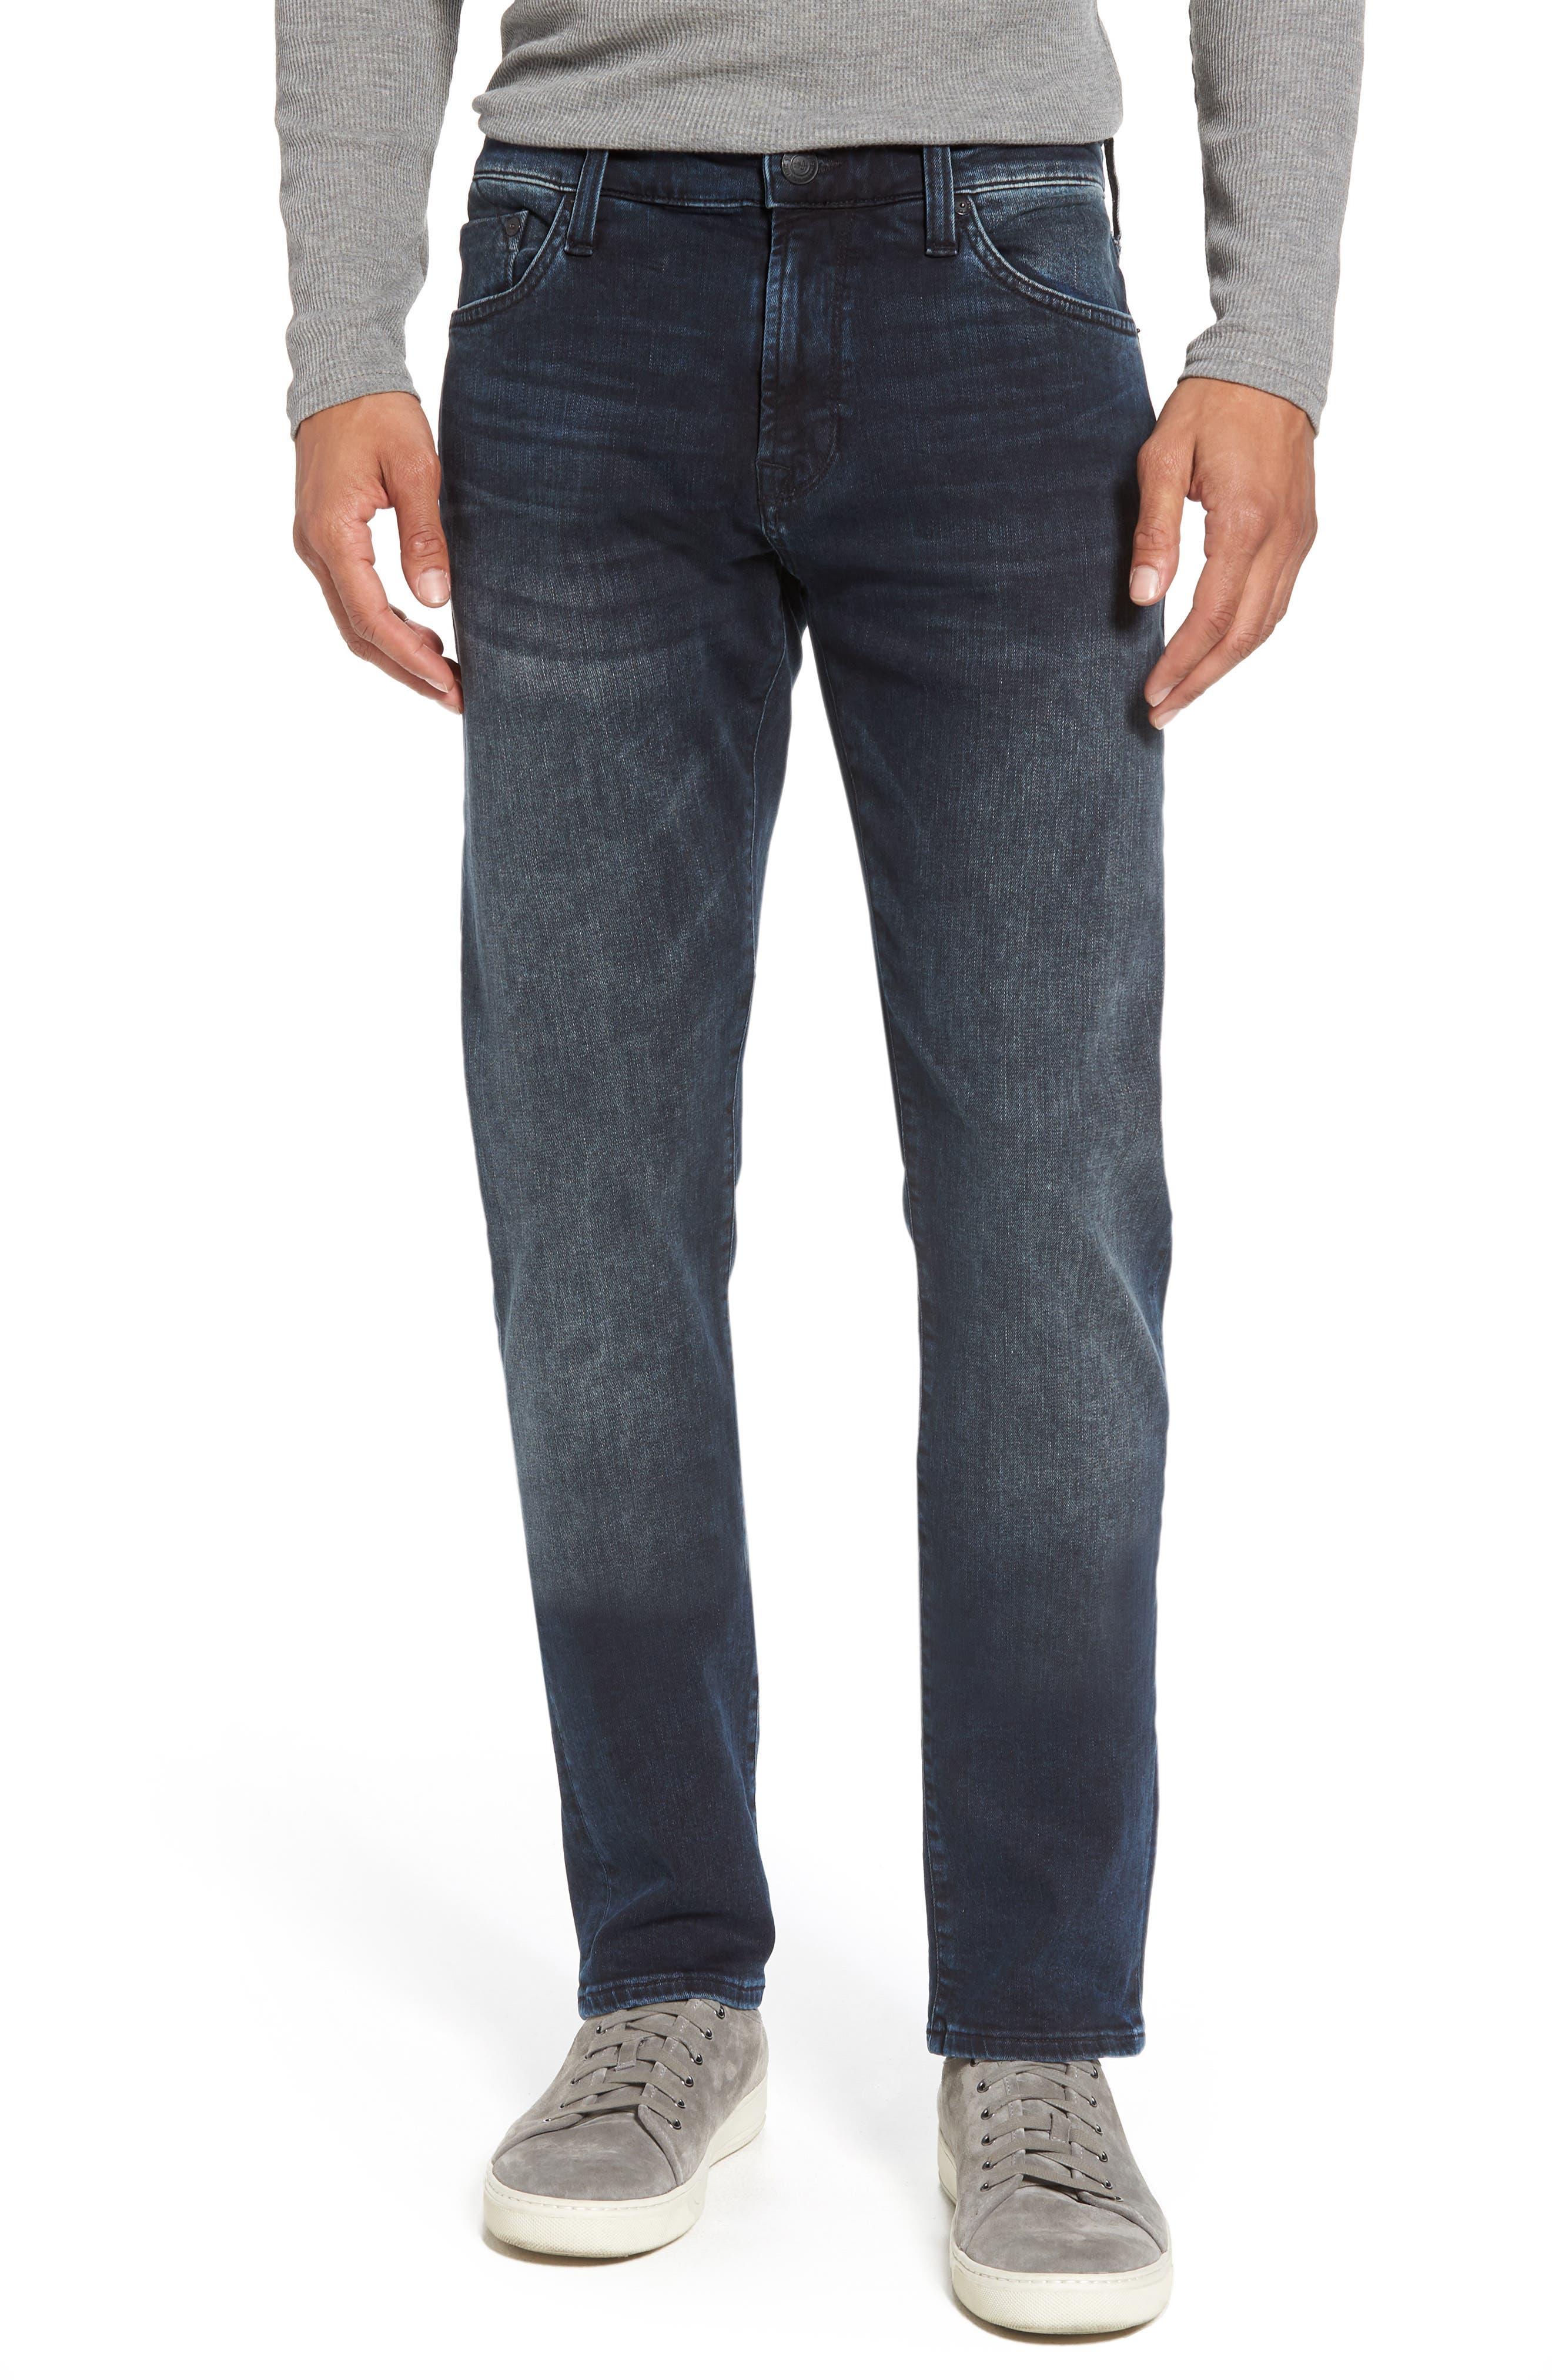 Jake Slim Fit Jeans,                         Main,                         color, 401